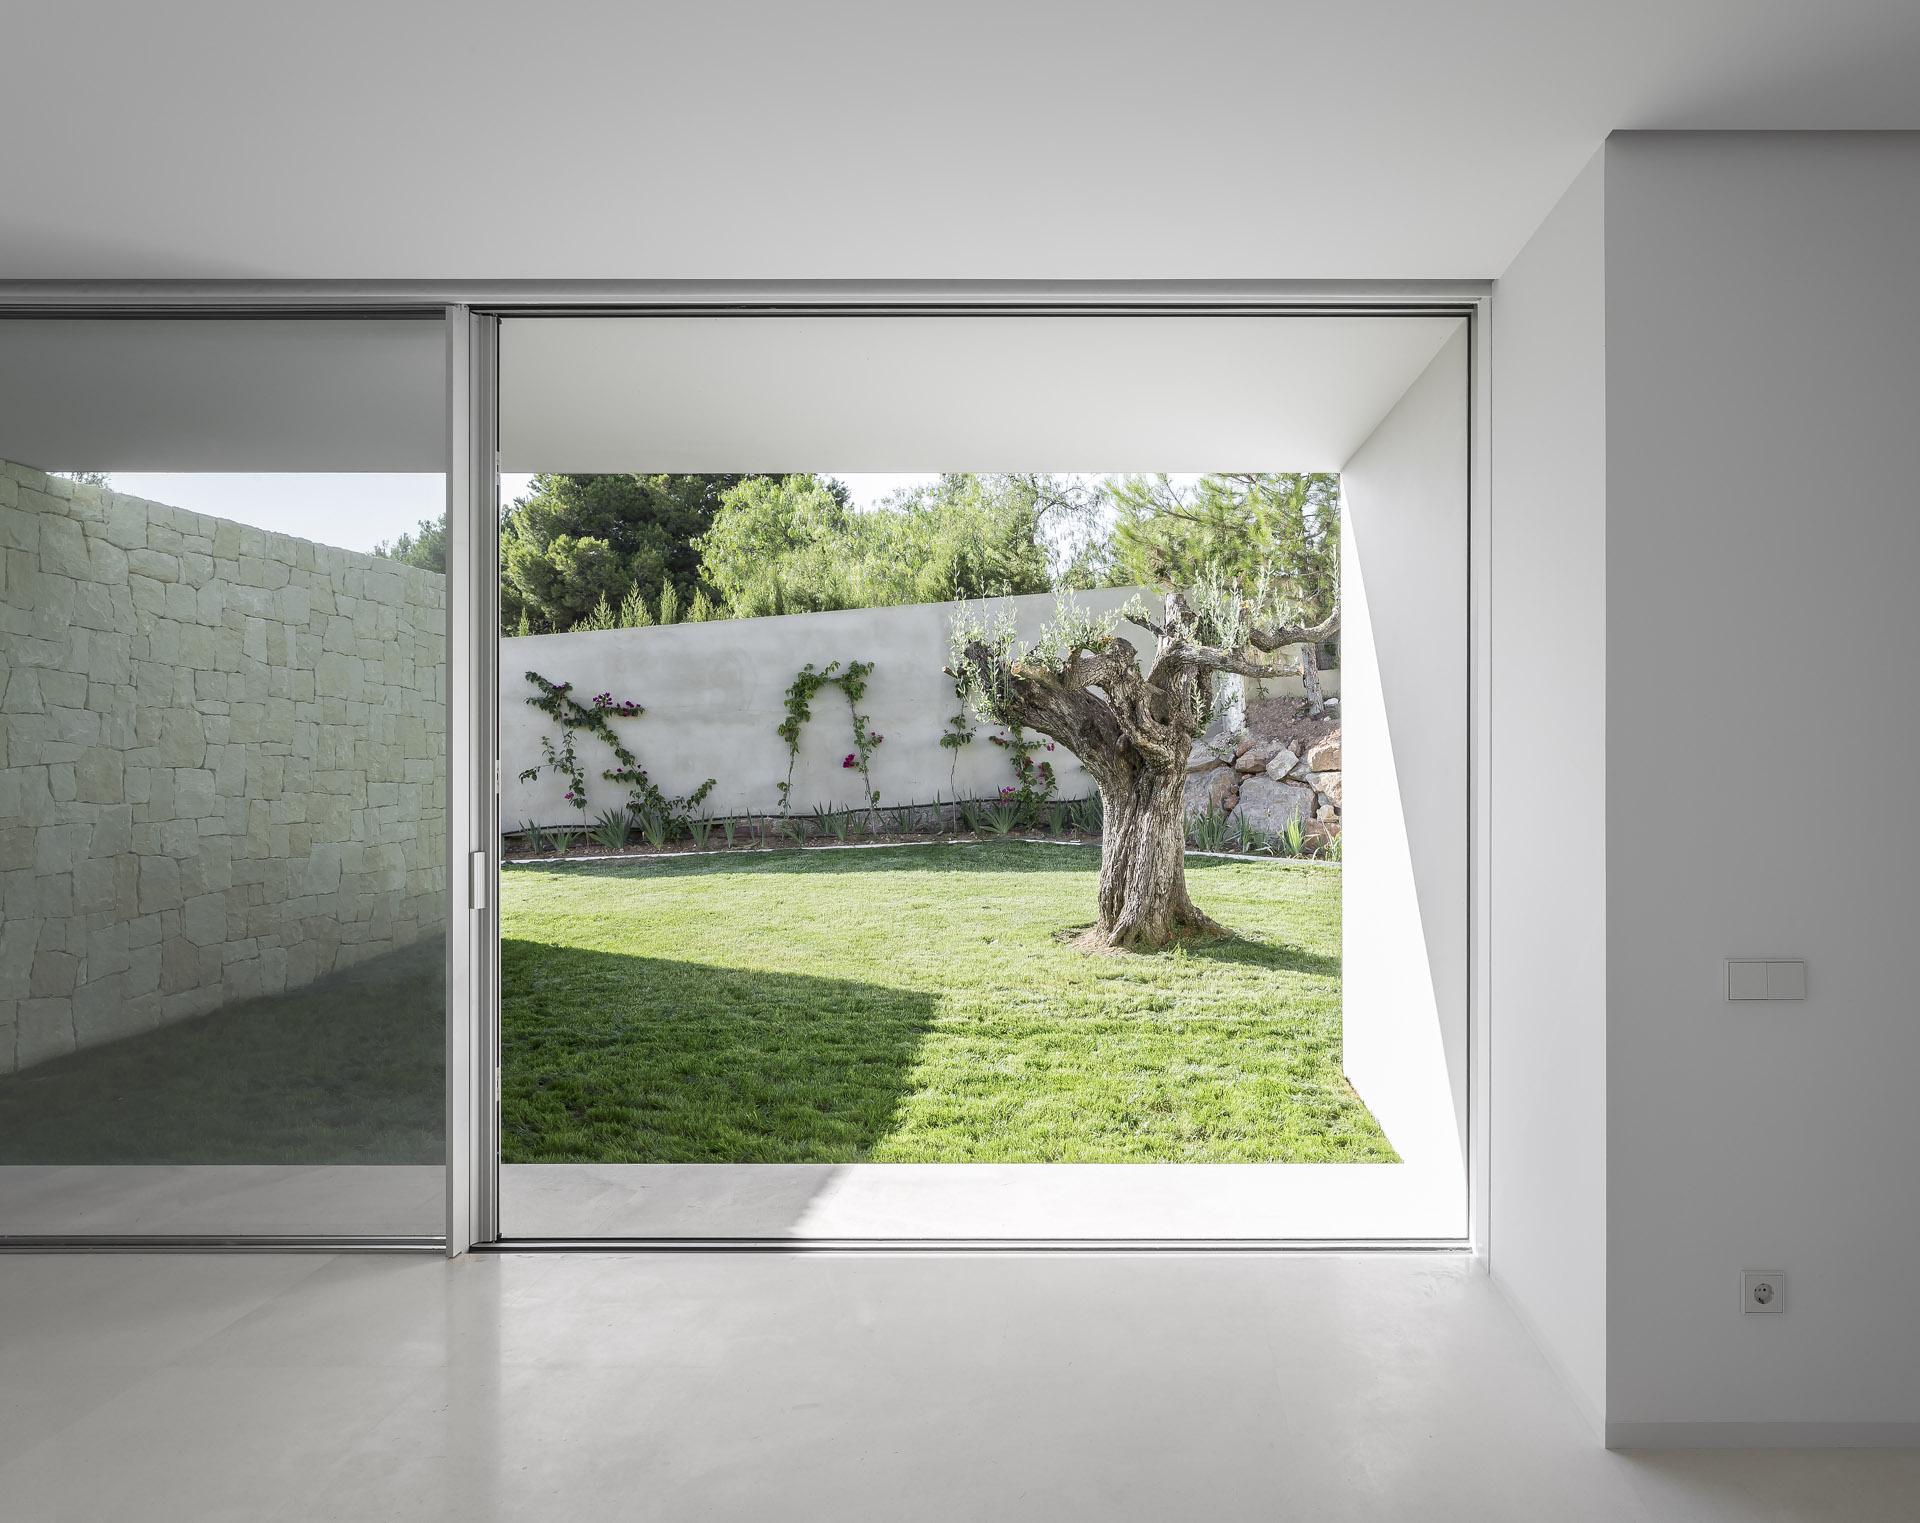 fotografia-arquitectura-valencia-german-cabo-gallardo-llopis-villamarchante-vivienda-30